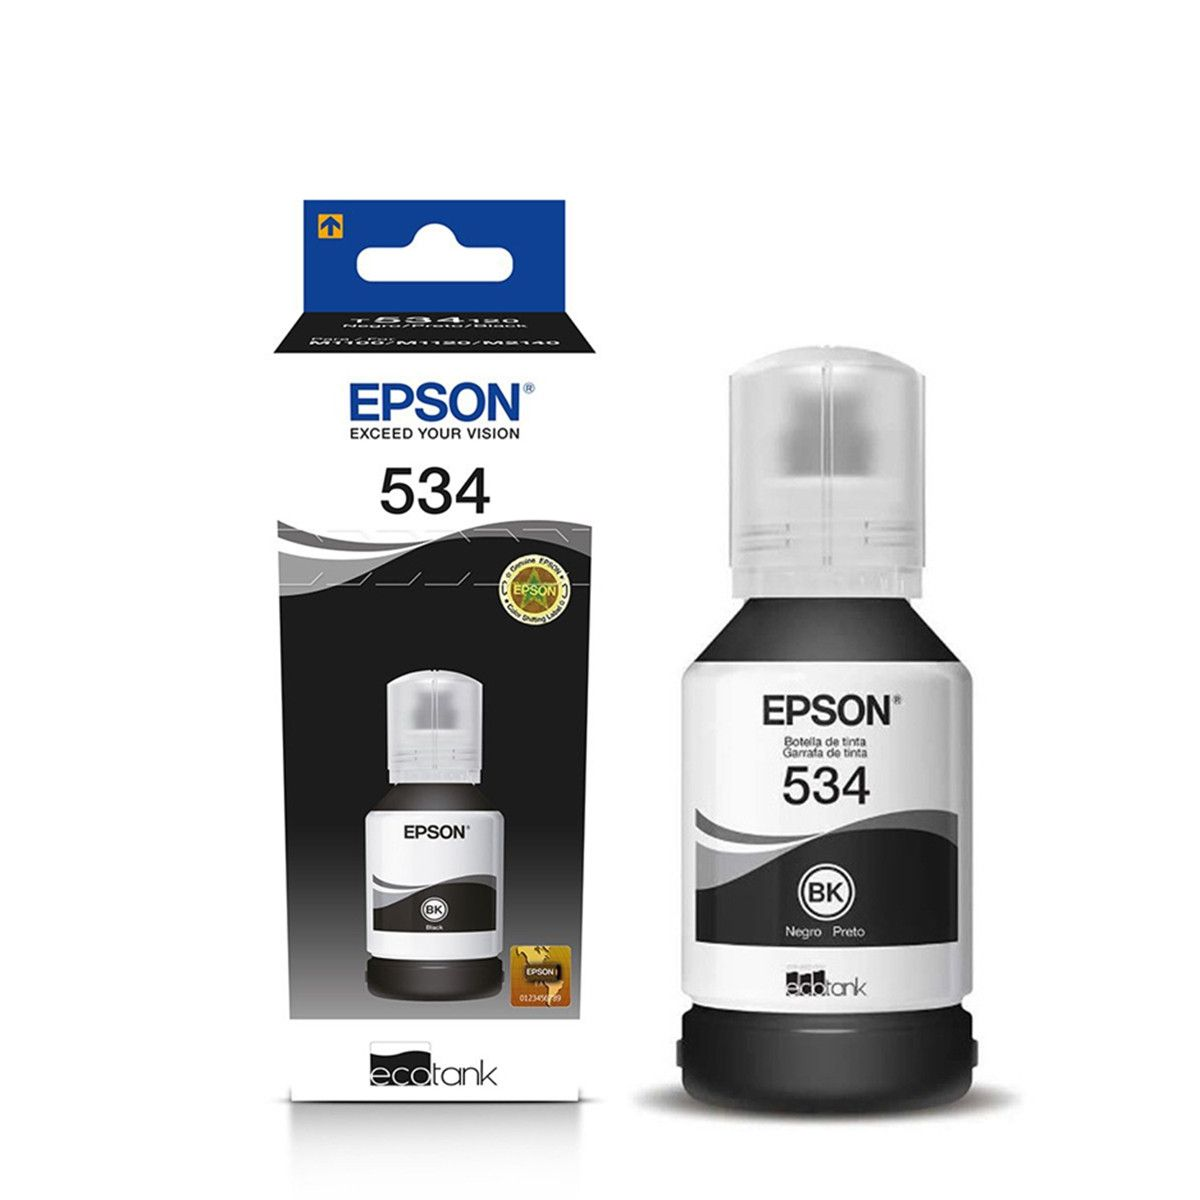 TINTA EPSON T534120 PRETO | M1120 M3180 M2170 M1180 M-3180 M-1120 M-2170 M-1180 | ORIGINAL 120ML